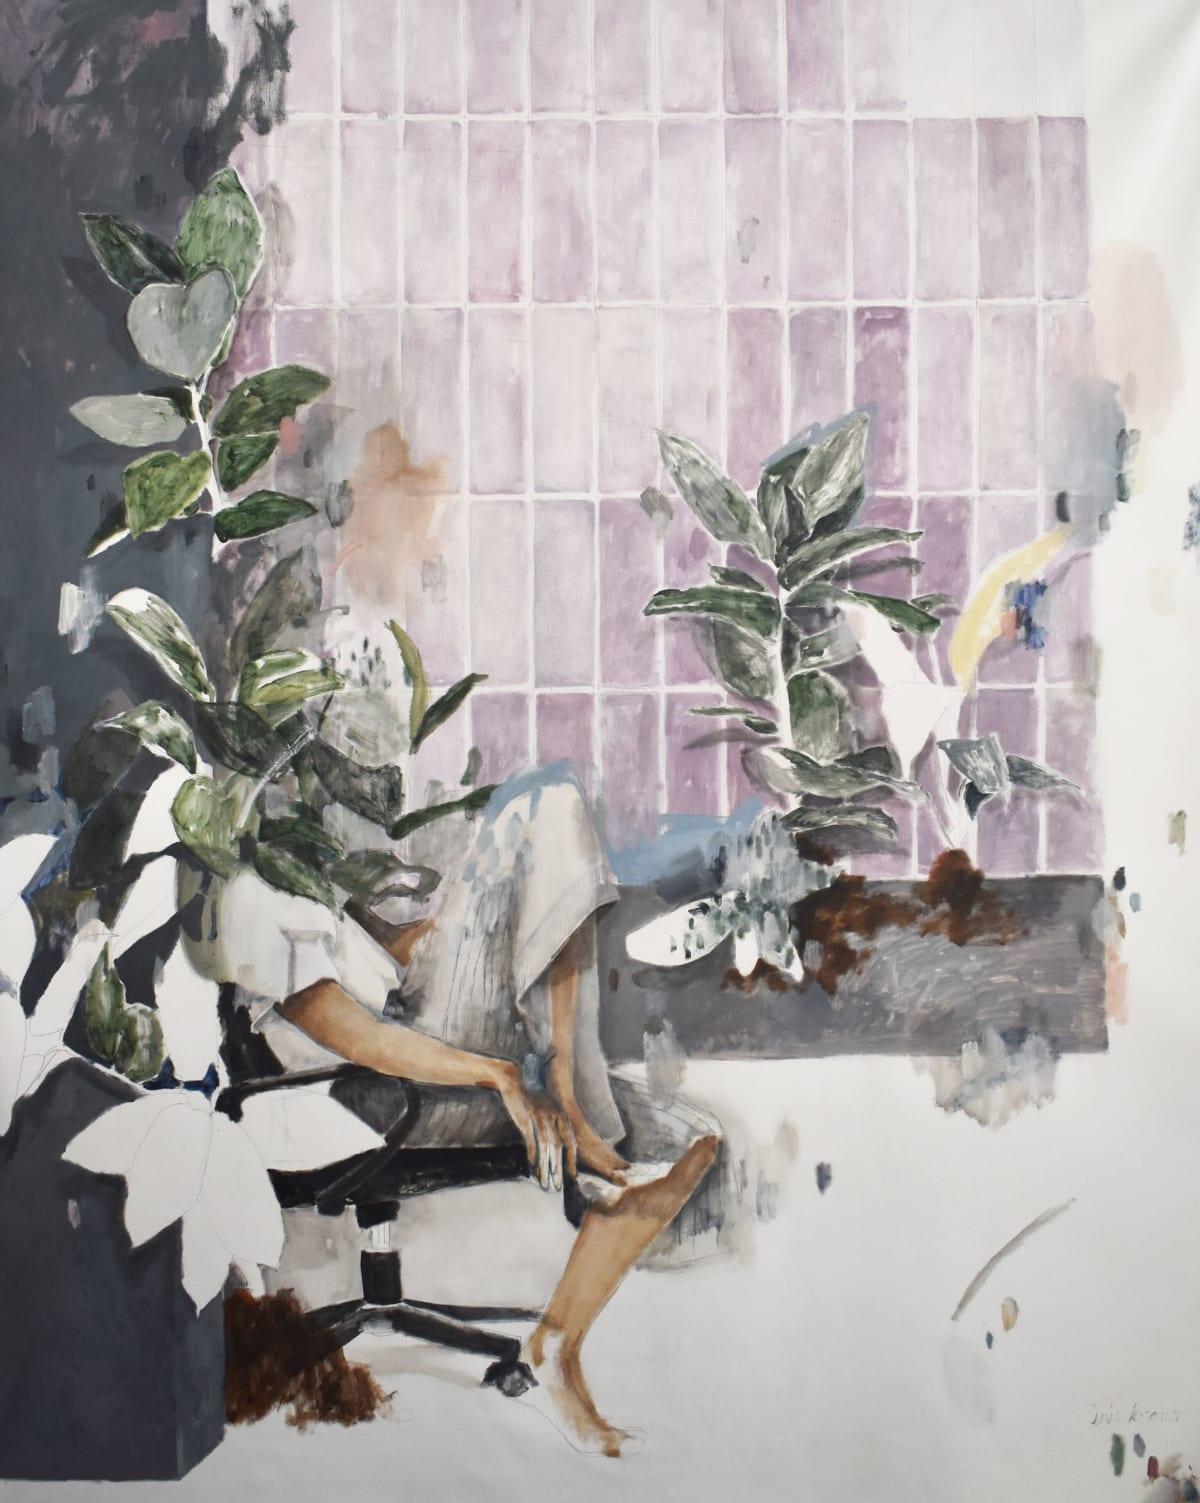 Ines Katamso, Contemplation, 2019